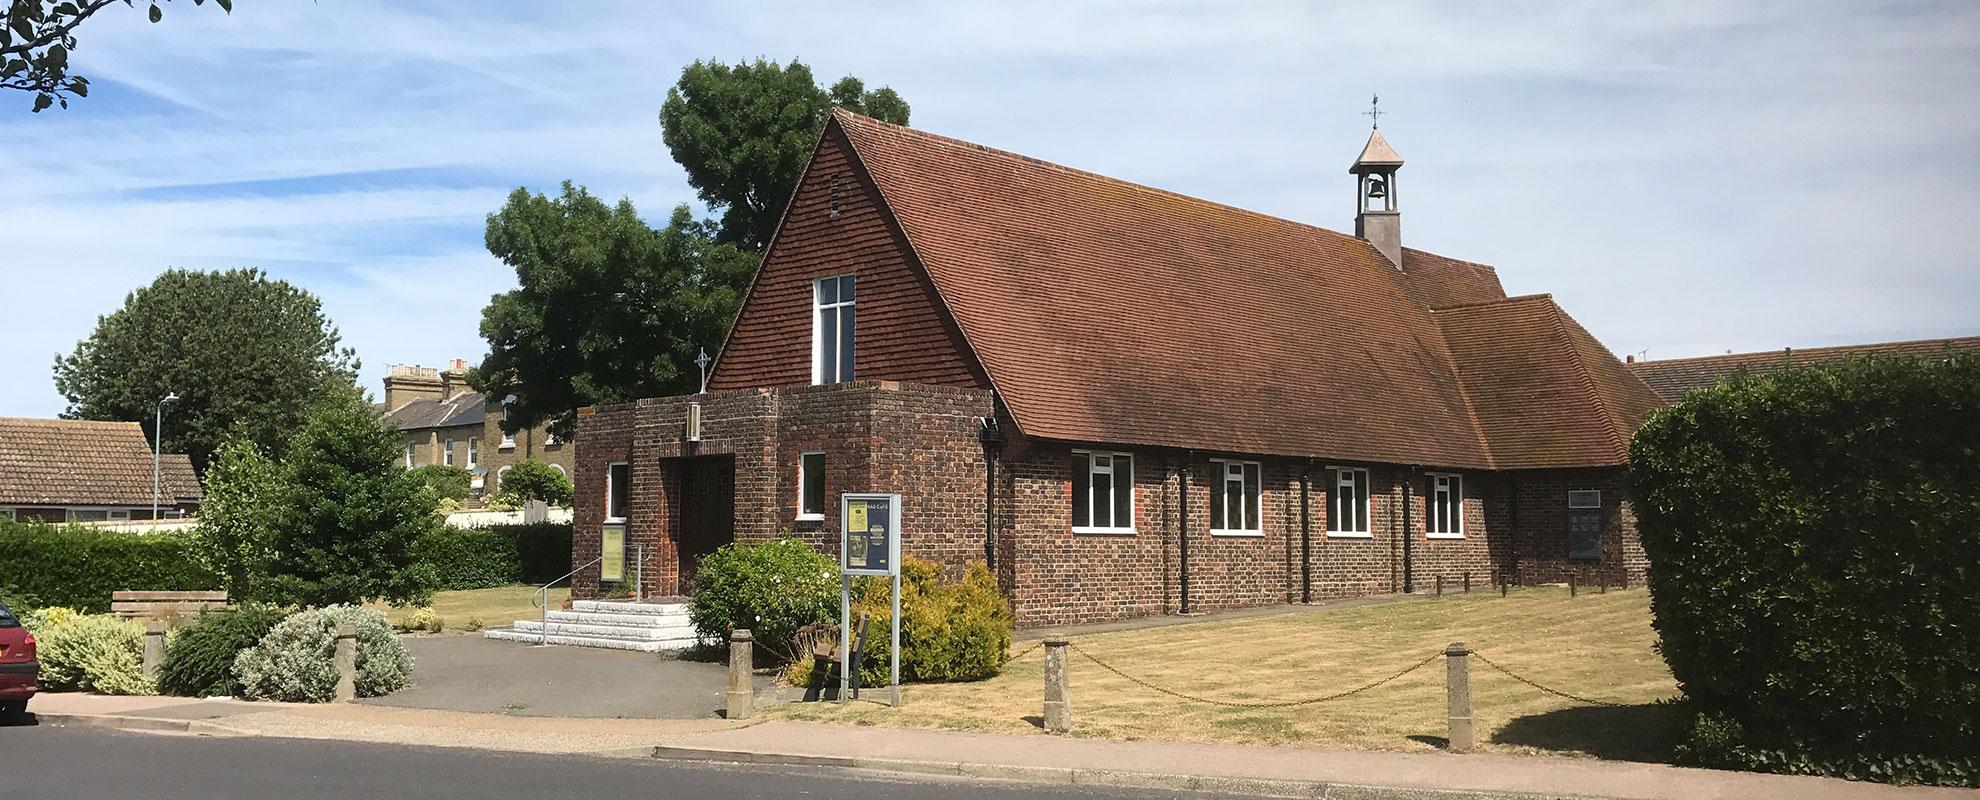 Open Church at St Thomas